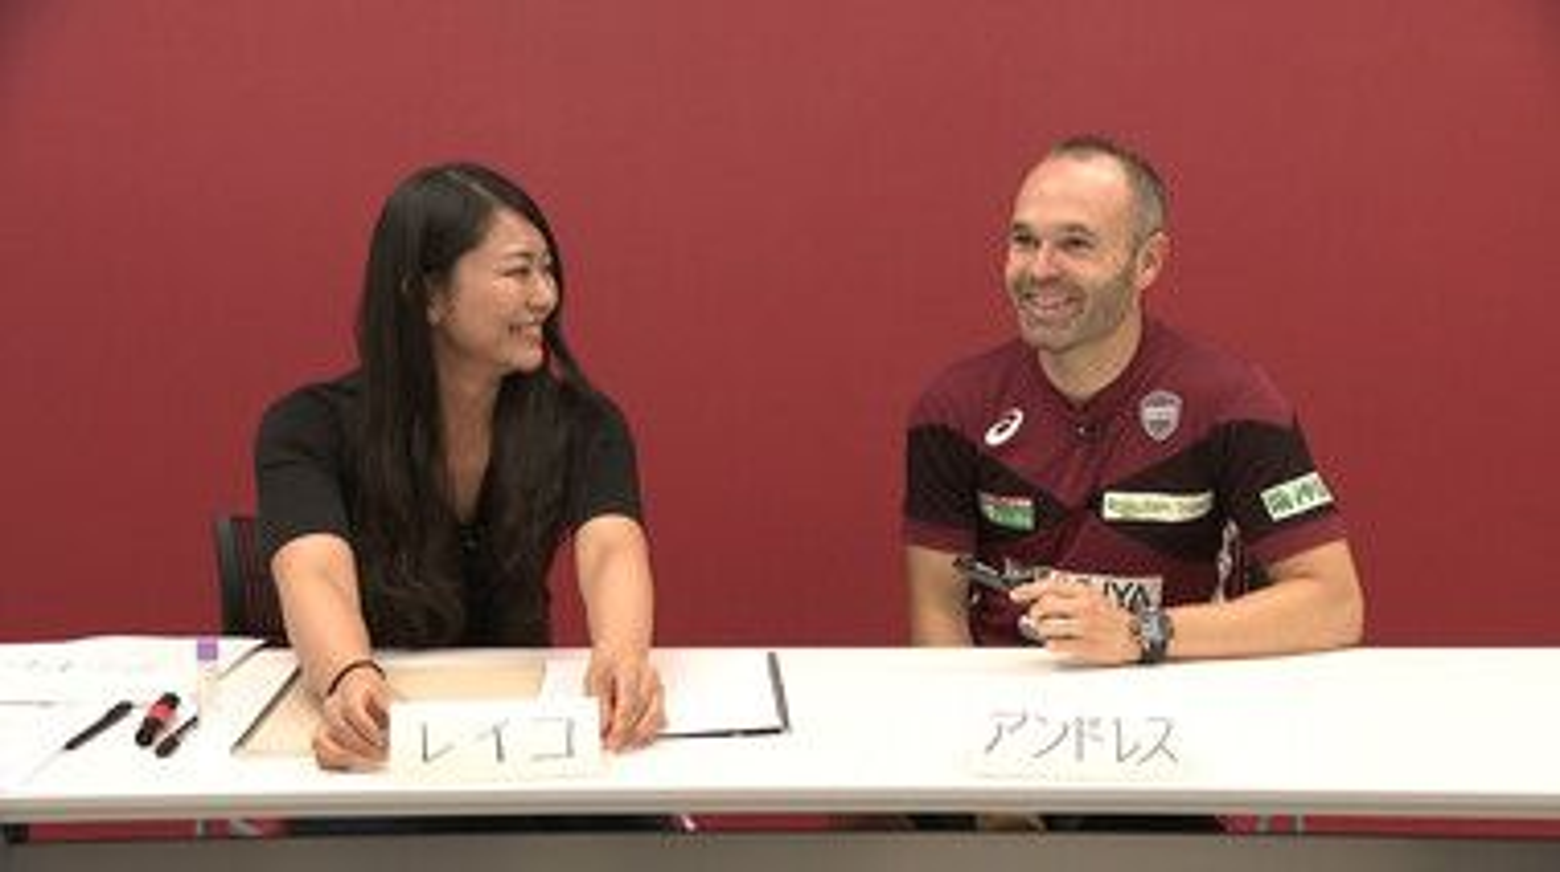 Iniesta TV: Discover Japan Episode 5: Discover Japan #4 Kanji Lesson 2